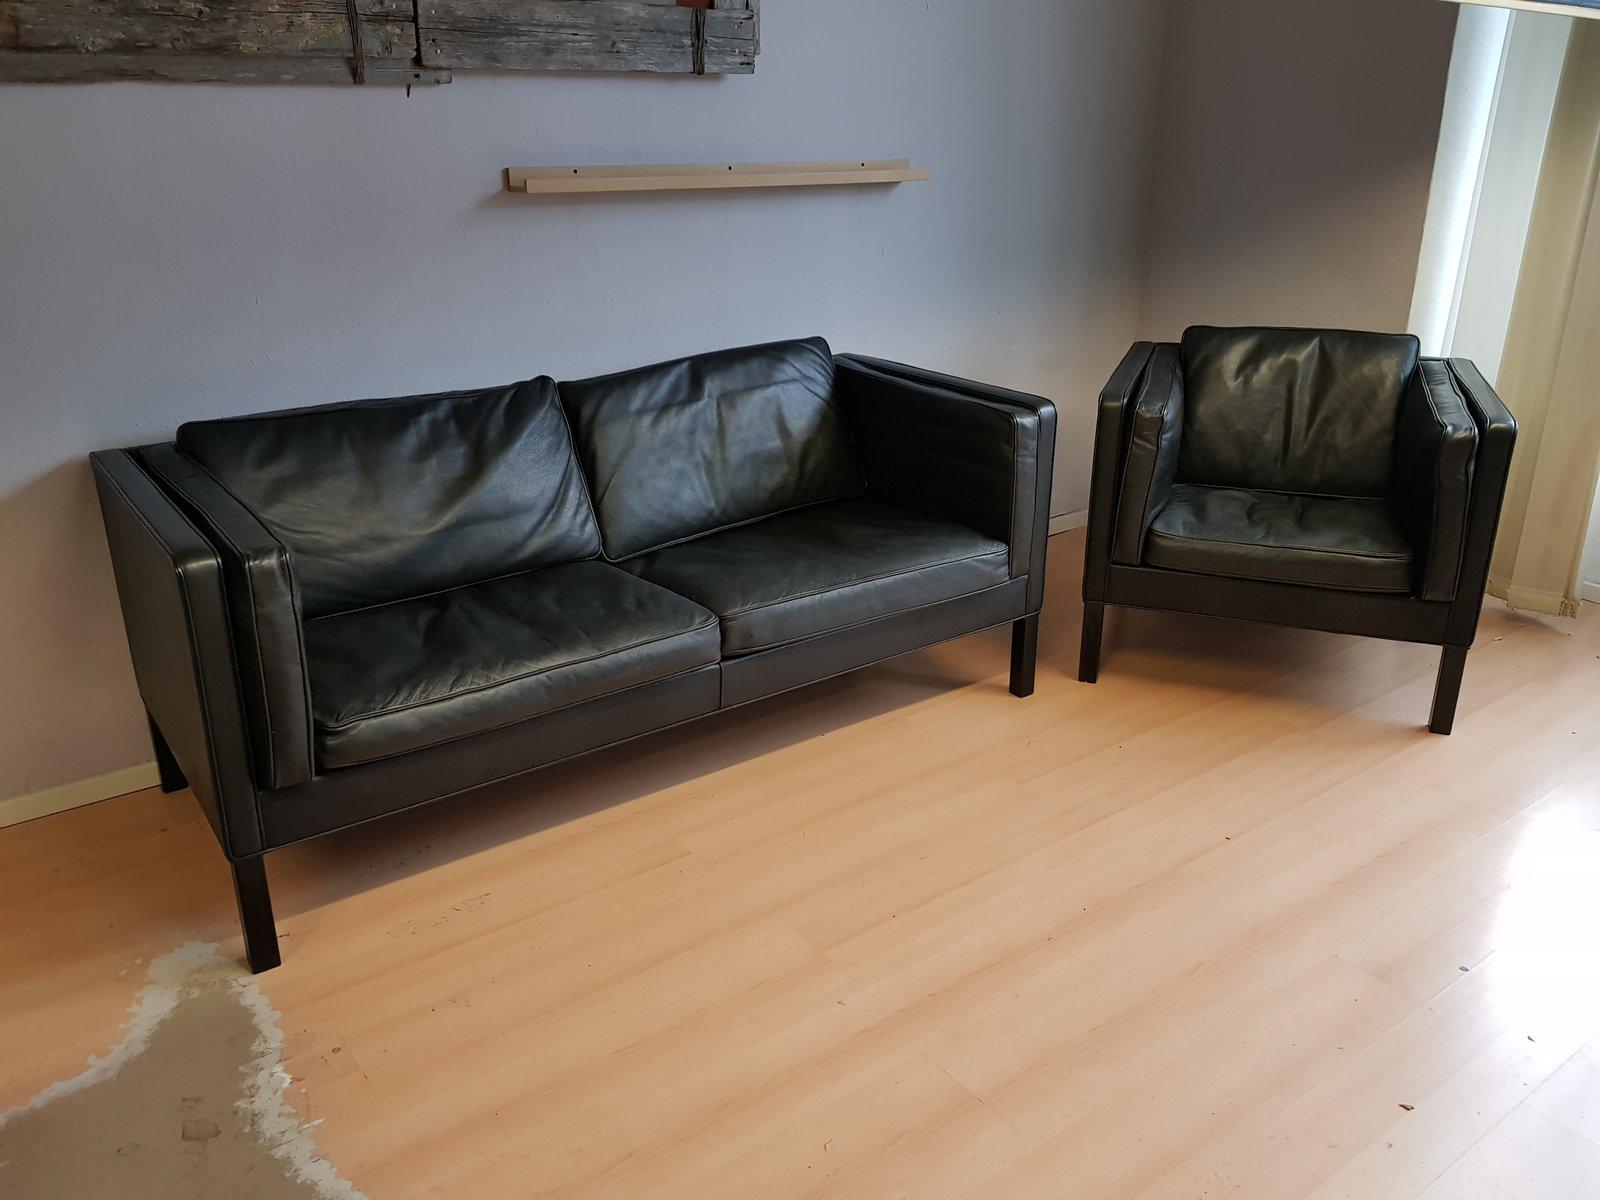 vintage modell 2335 sofa mit sessel von b rge mogensen f r fredericia 2er set bei pamono kaufen. Black Bedroom Furniture Sets. Home Design Ideas